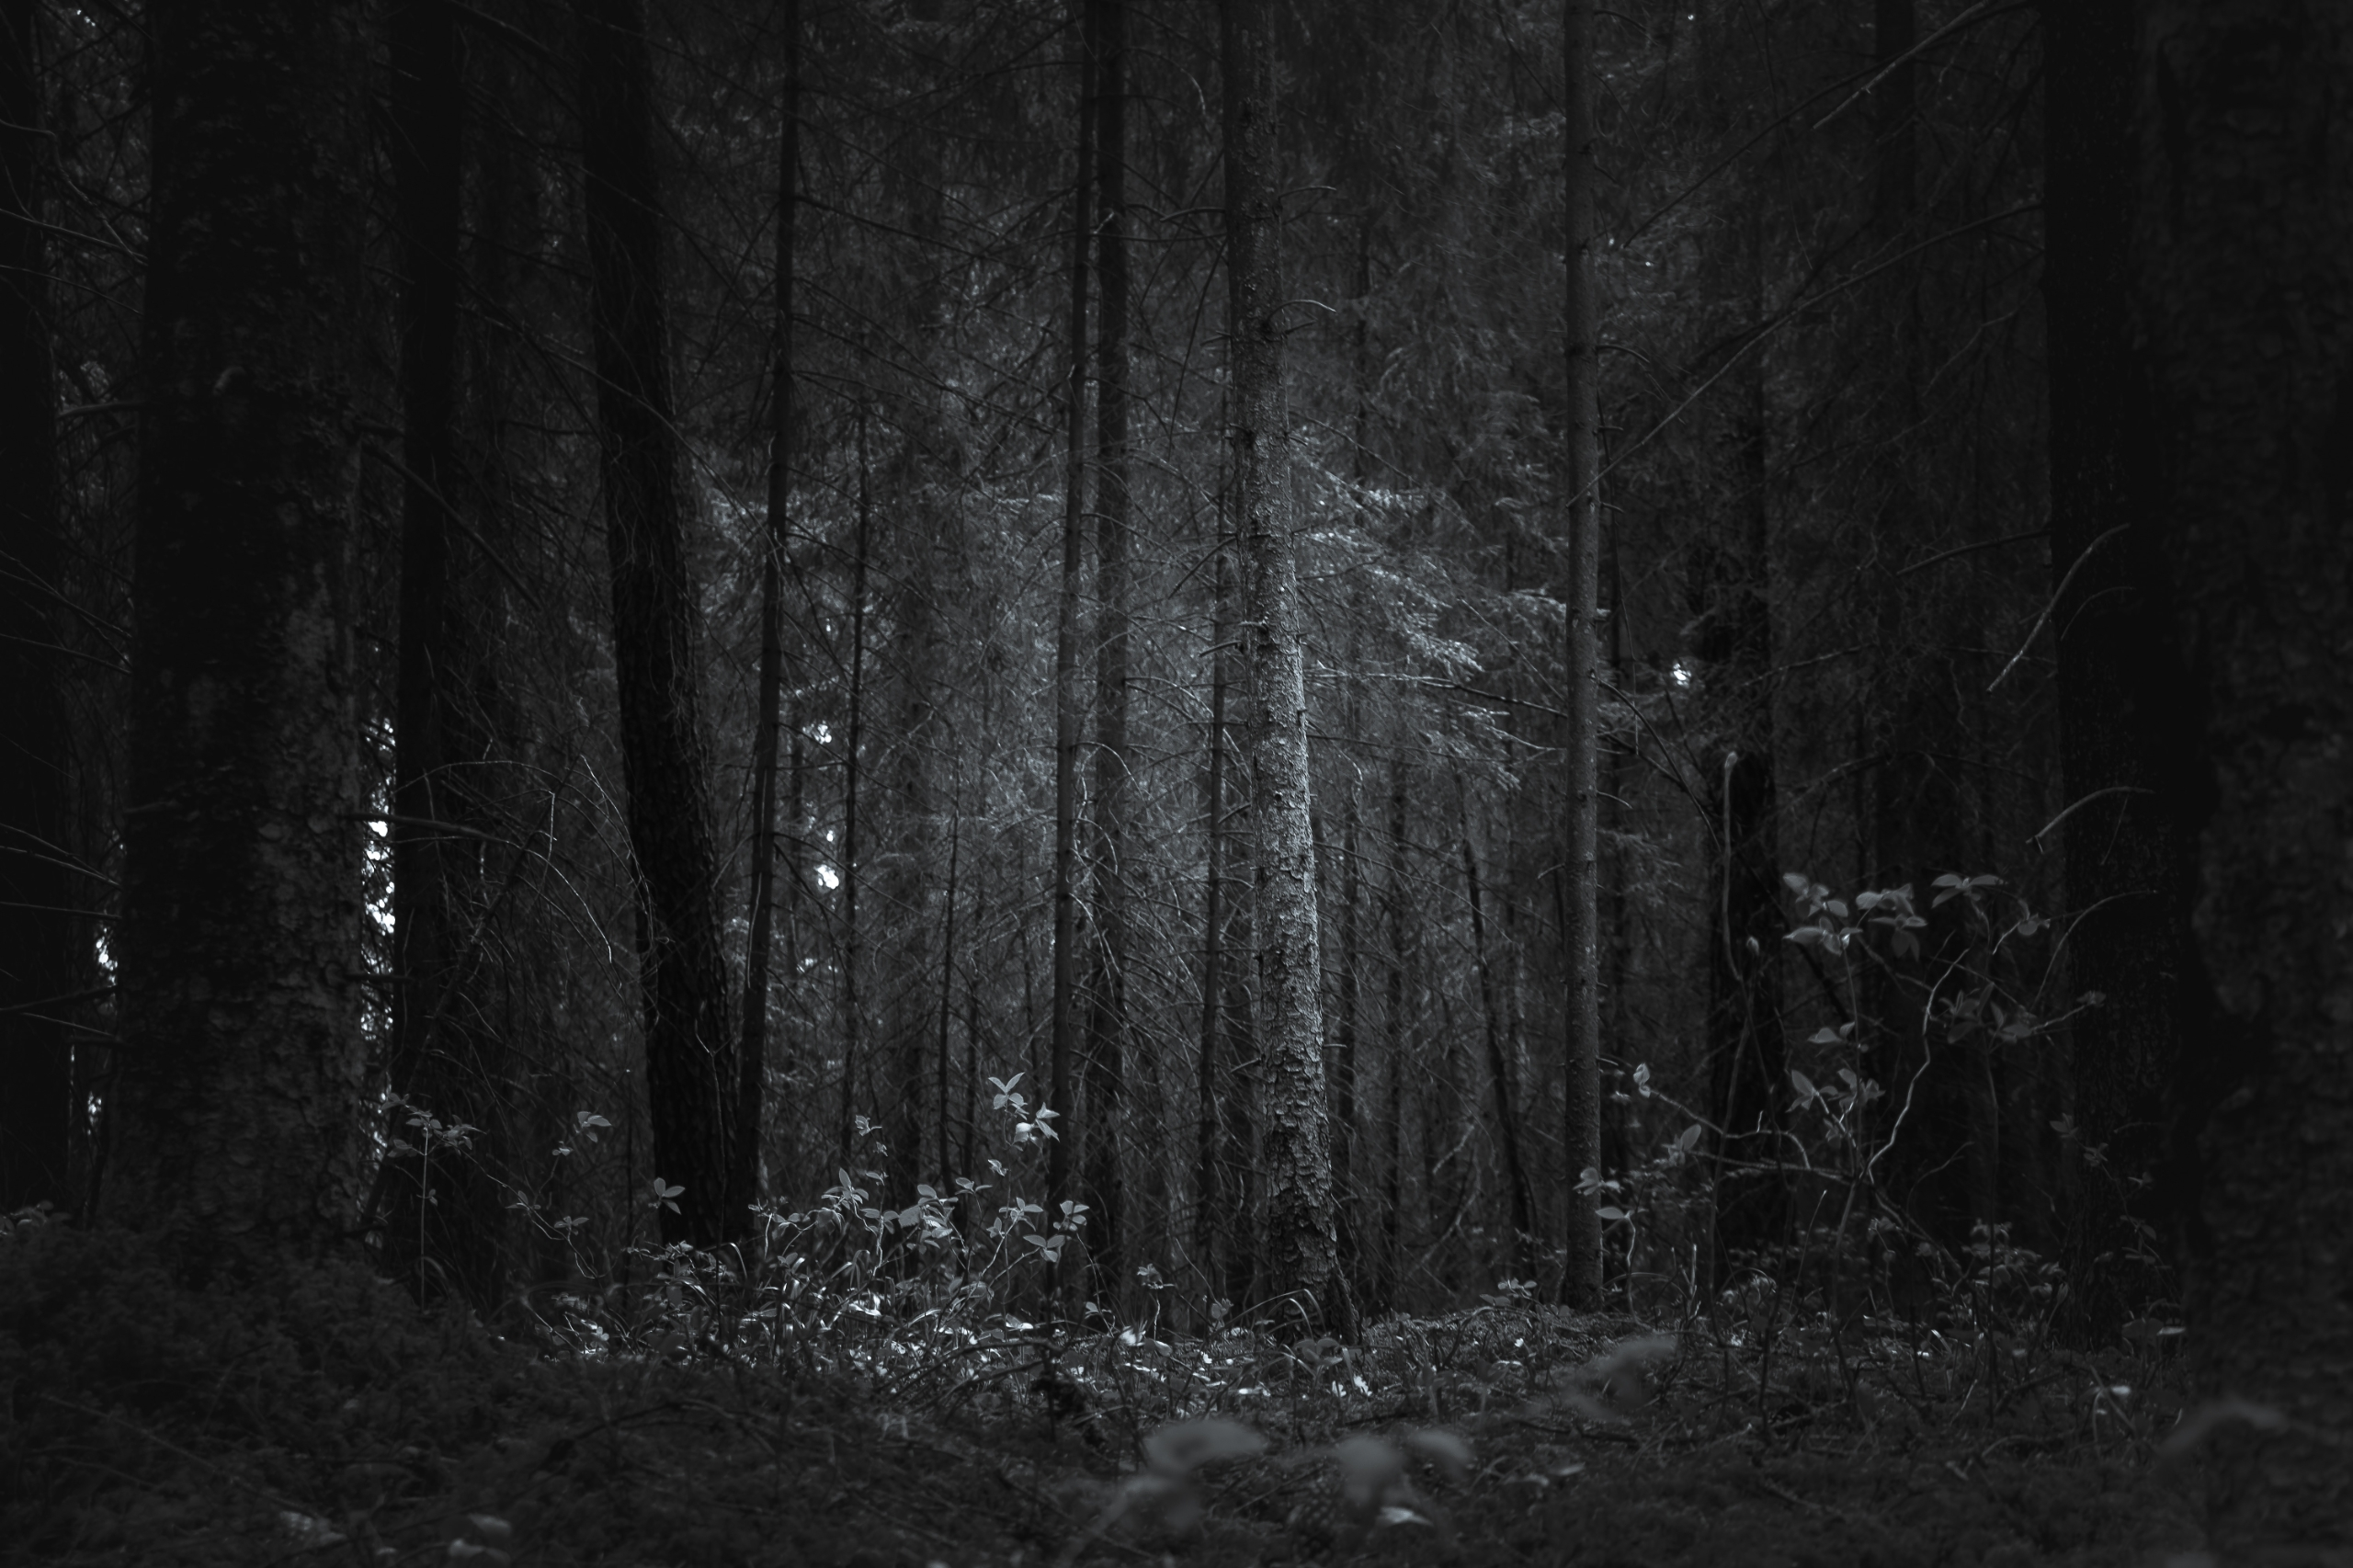 lithuania, lietuva, лес, forest - beheroght | ello